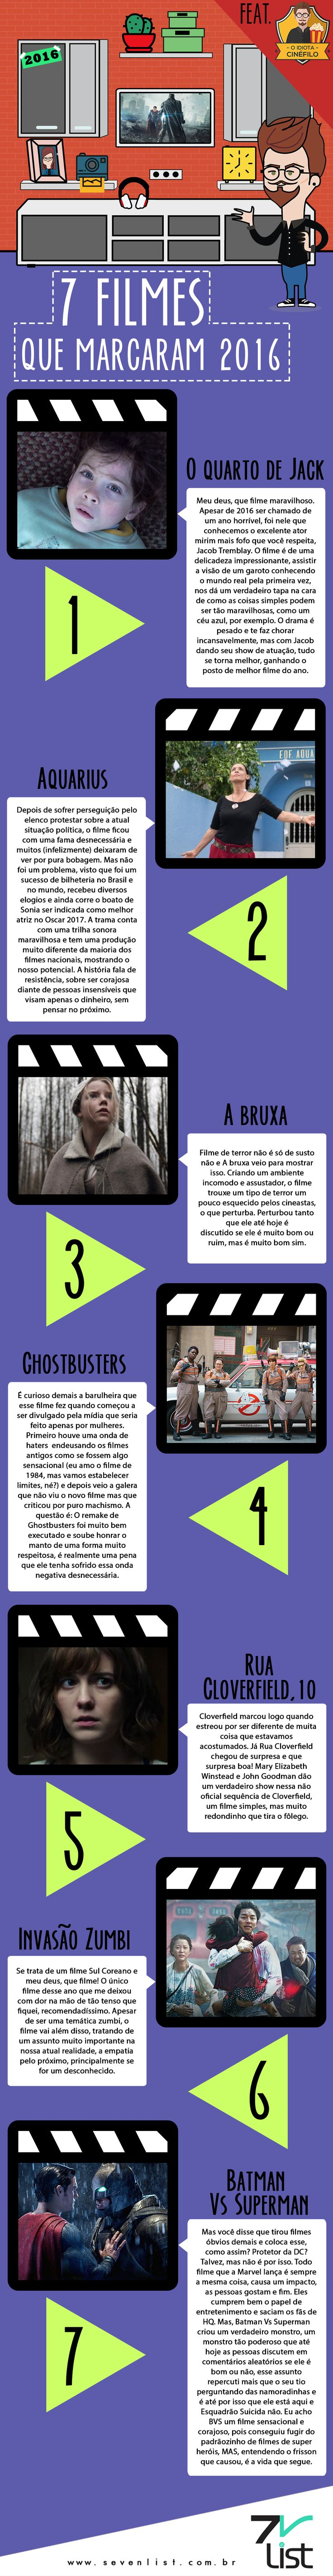 #SevenList #Art #Infográfico #Movies #2016 #Filmes #Oidiotacinéfilo #Cinema #Room #OquartodeJack #BatmanVsSuperman #Aquarius #CaçaFantasmas #Ghostbusters